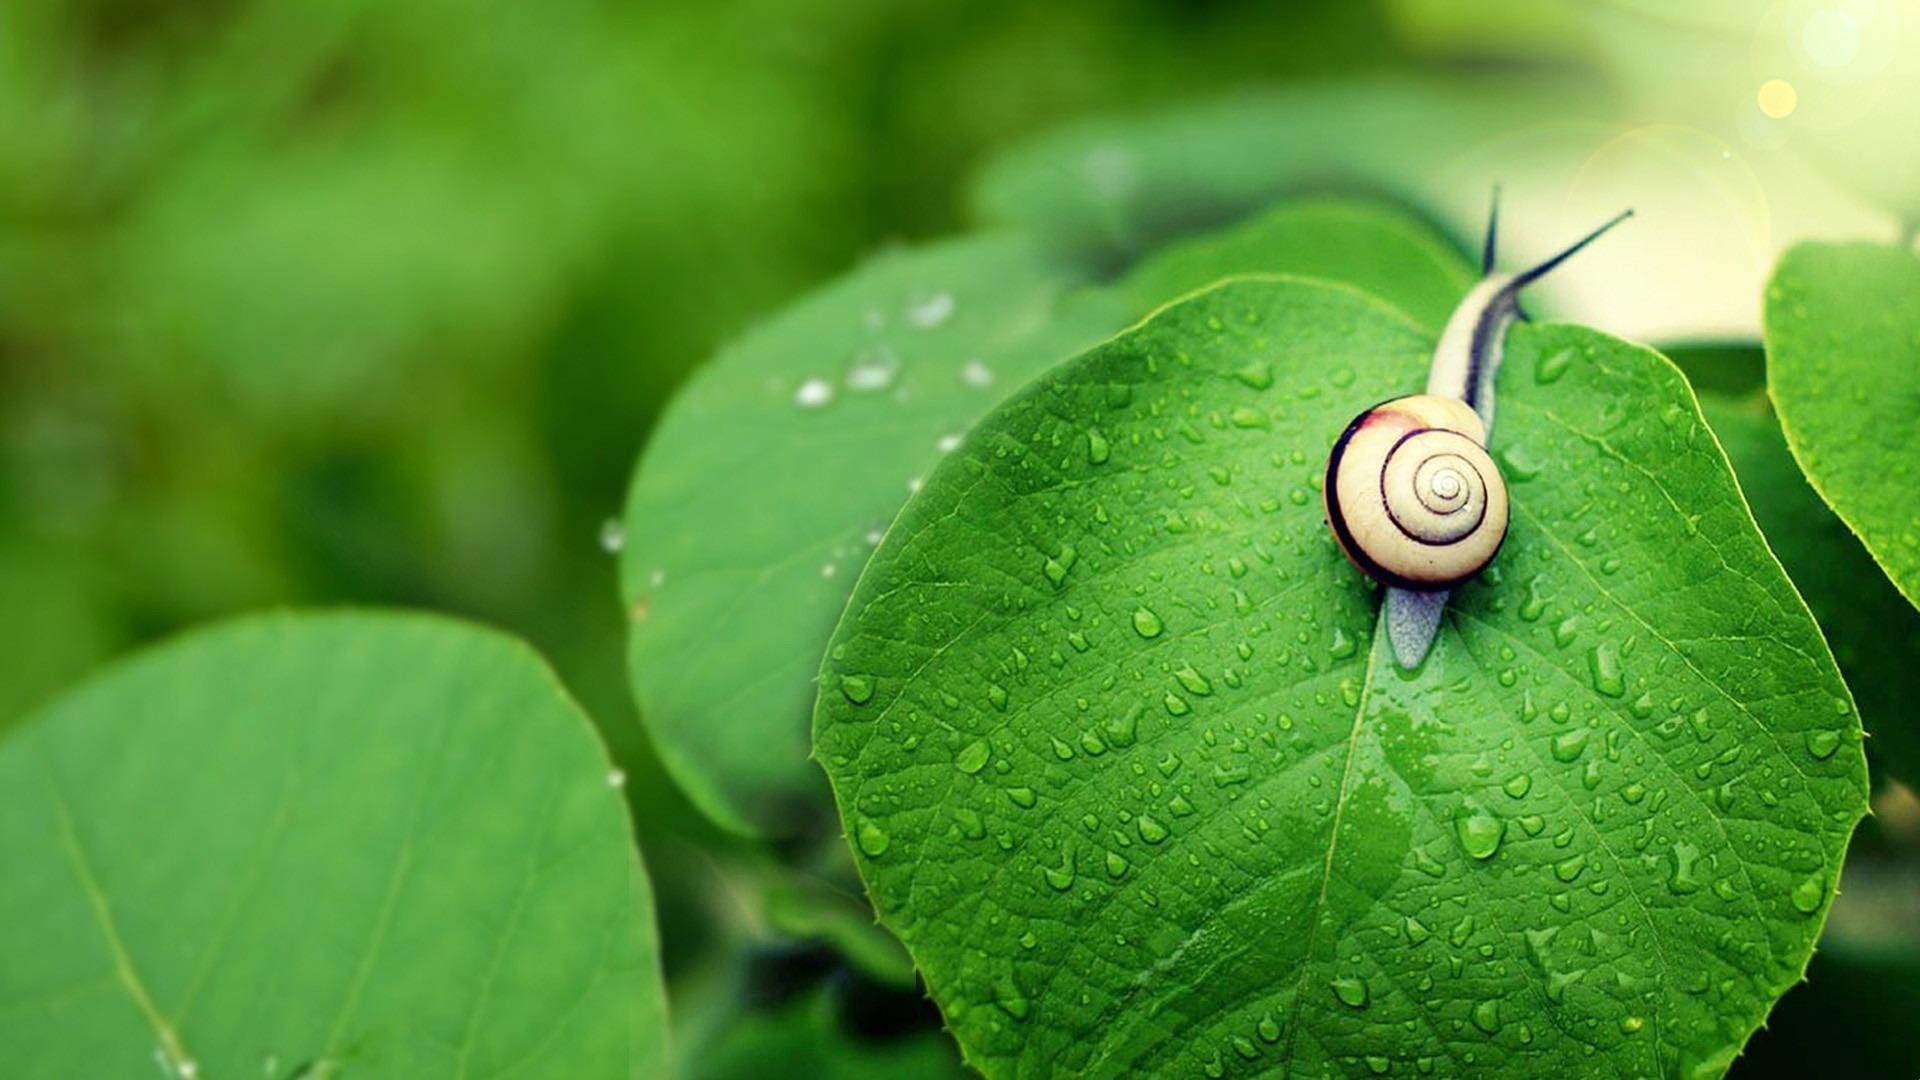 snail photos